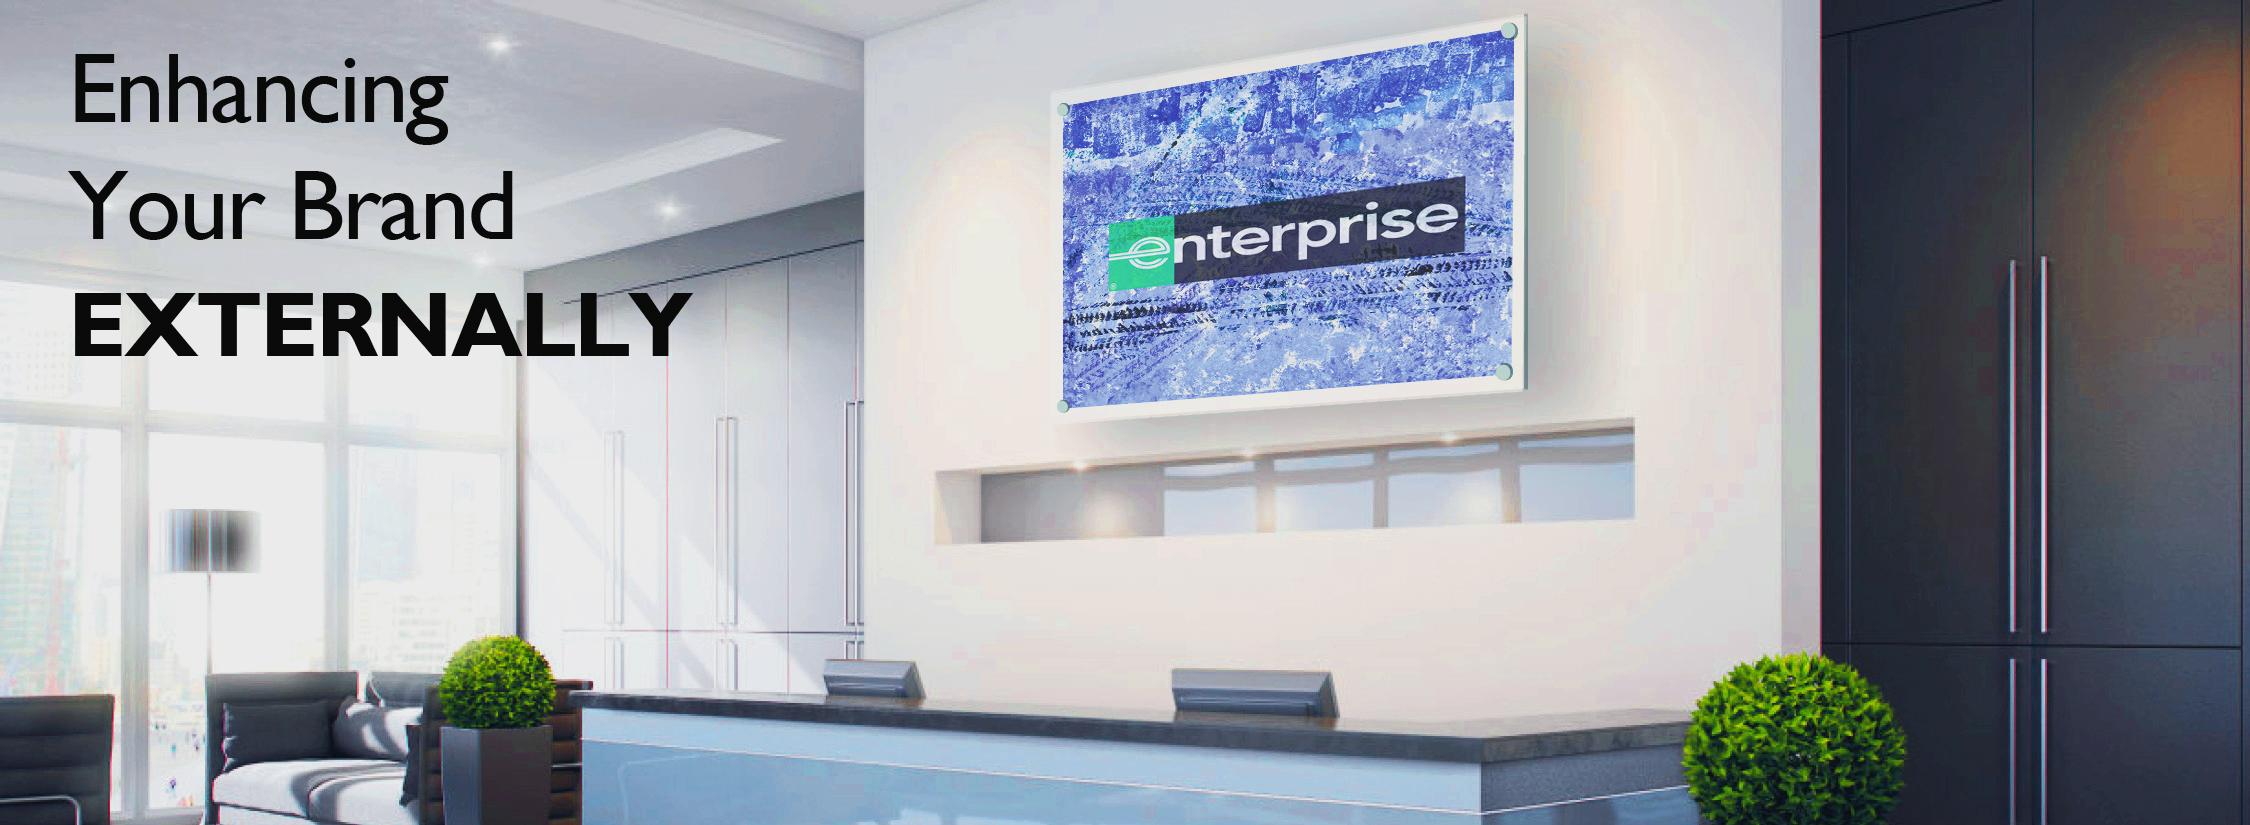 swipe enterprise (enhancing you brand)